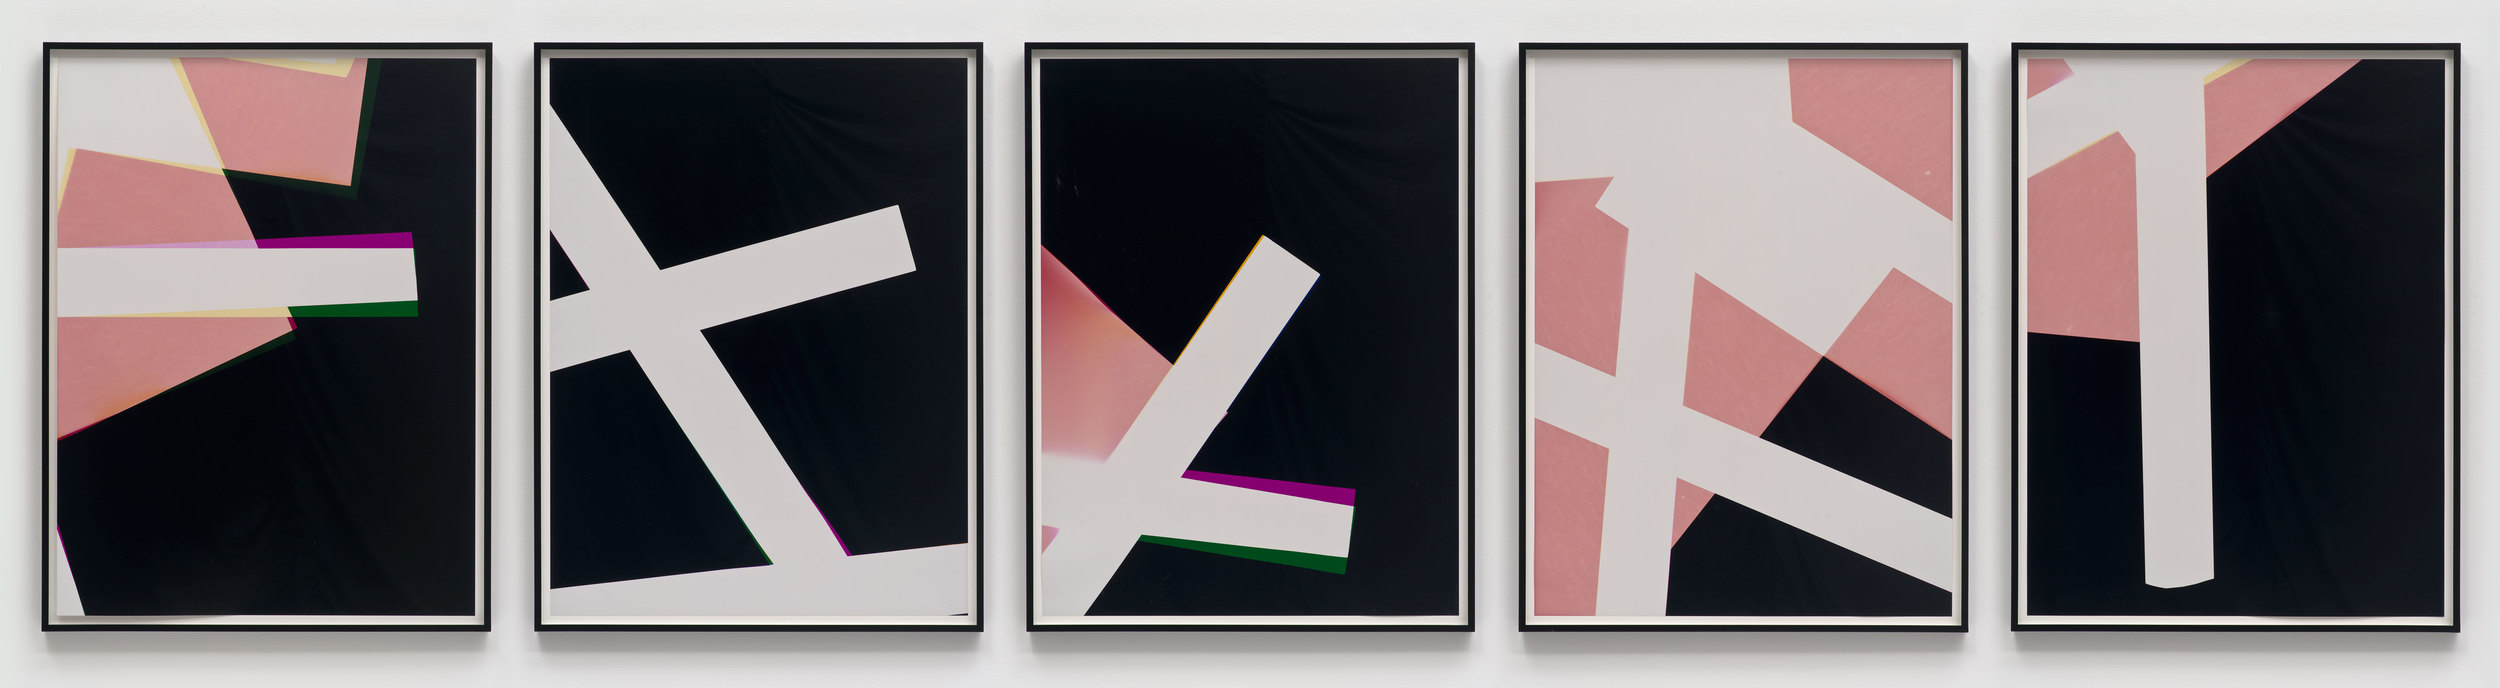 Combine Prints (Single Phase Composition: CMY/Five Magnet: Irvine, California, March 25, 2010, Fuji Color Crystal Archive Super Type C, Em. No. 148-006, 19010–19410)    2010   Color photographic paper  40 x 30 inches each, 5 parts